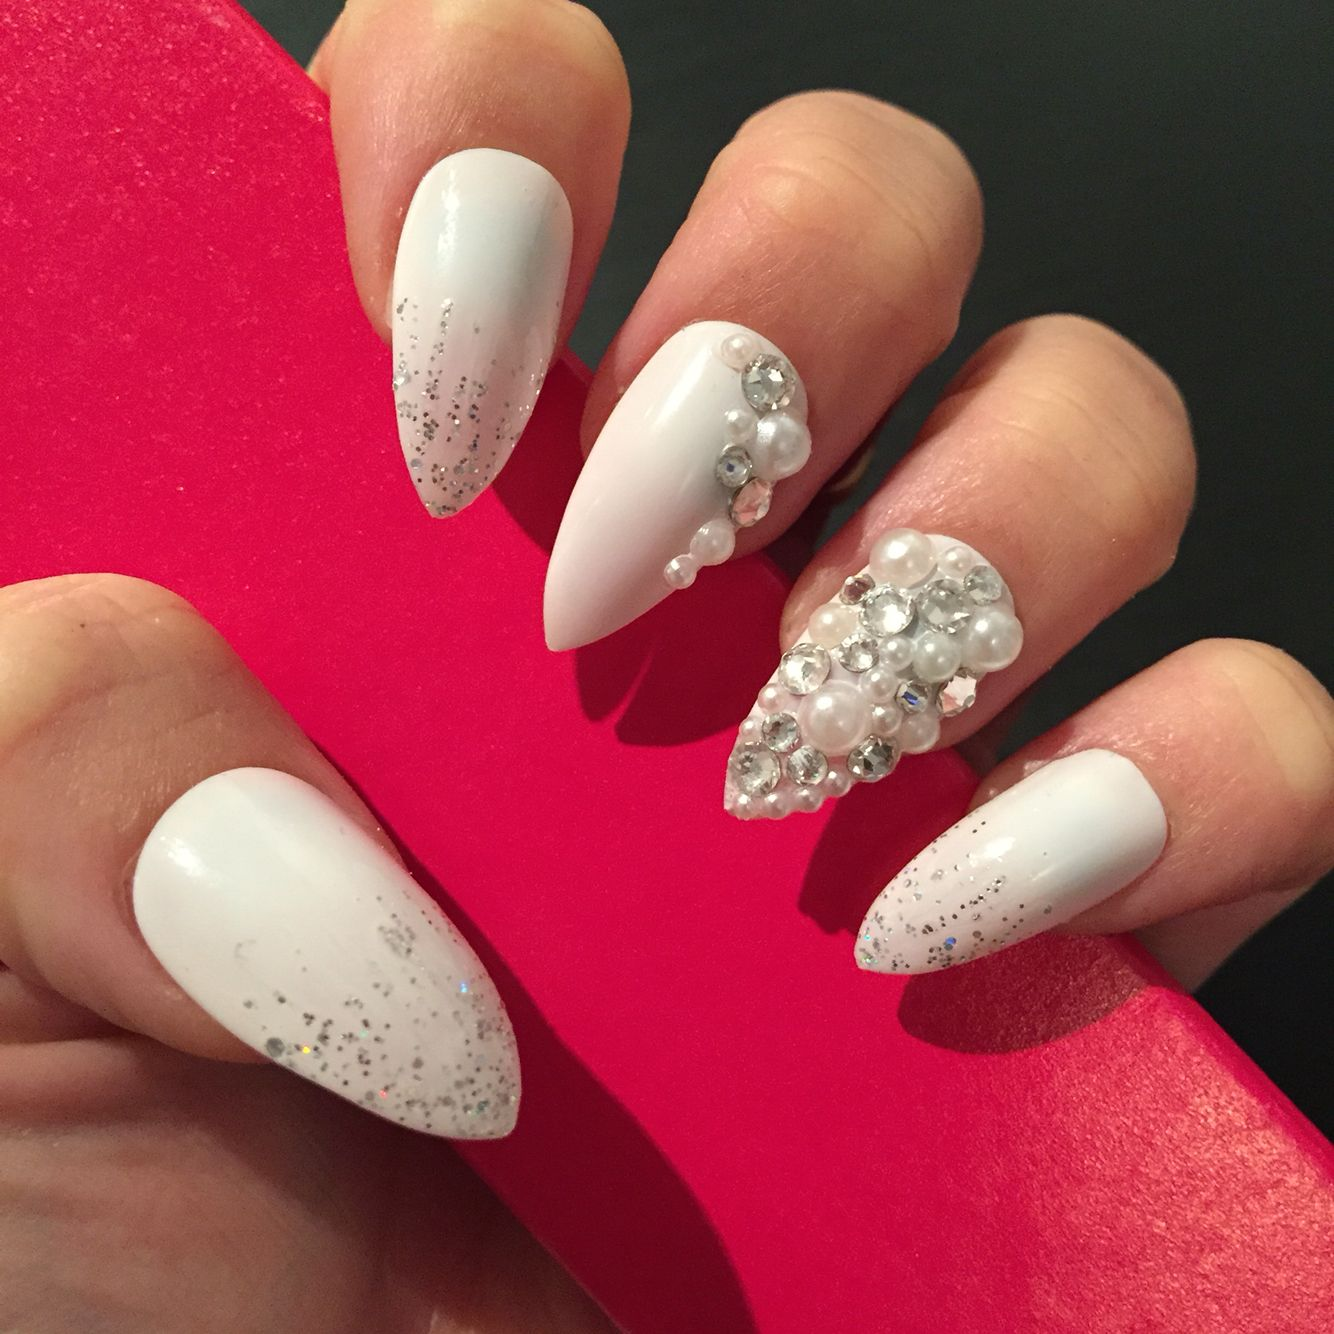 Stiletto wedding nails with pearls and Swarovski | Nails | Pinterest ...